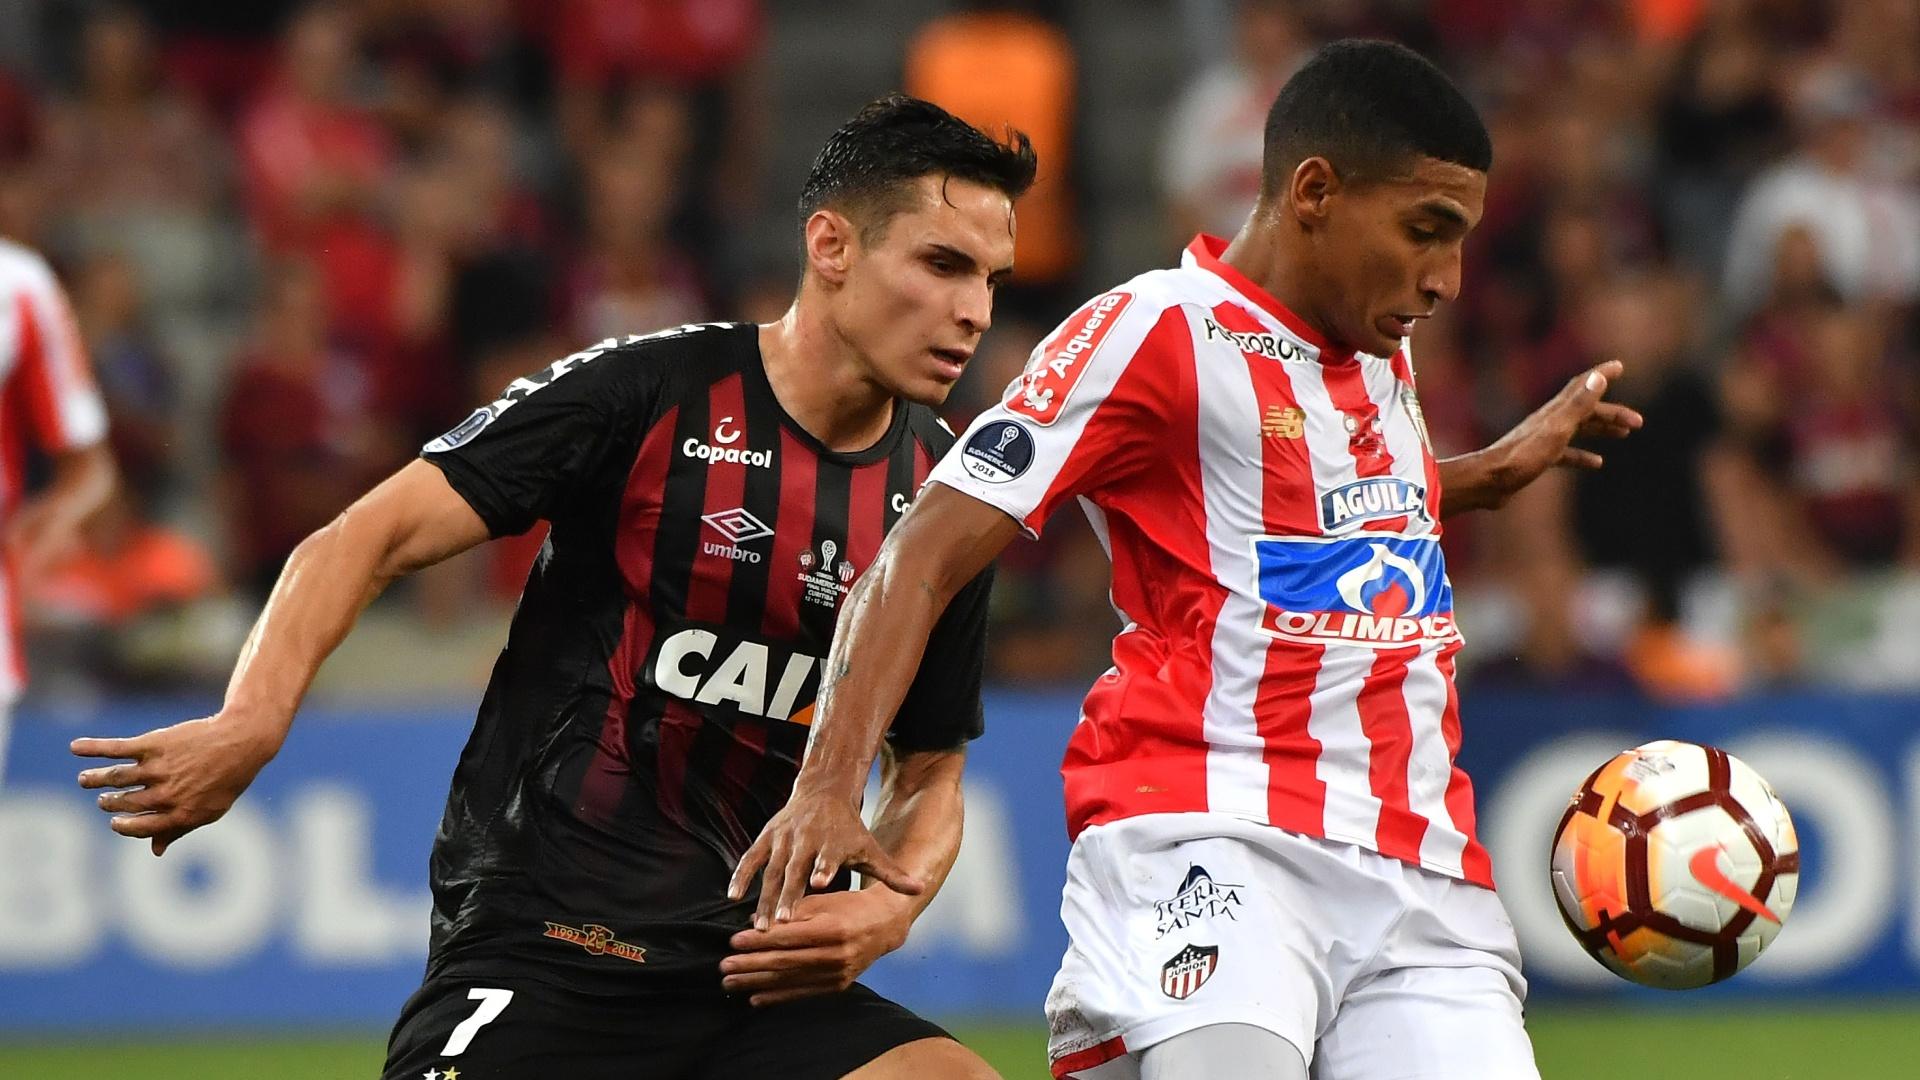 Raphael Veiga, durante partida entre Atlético-PR e Junior de Barranquilla